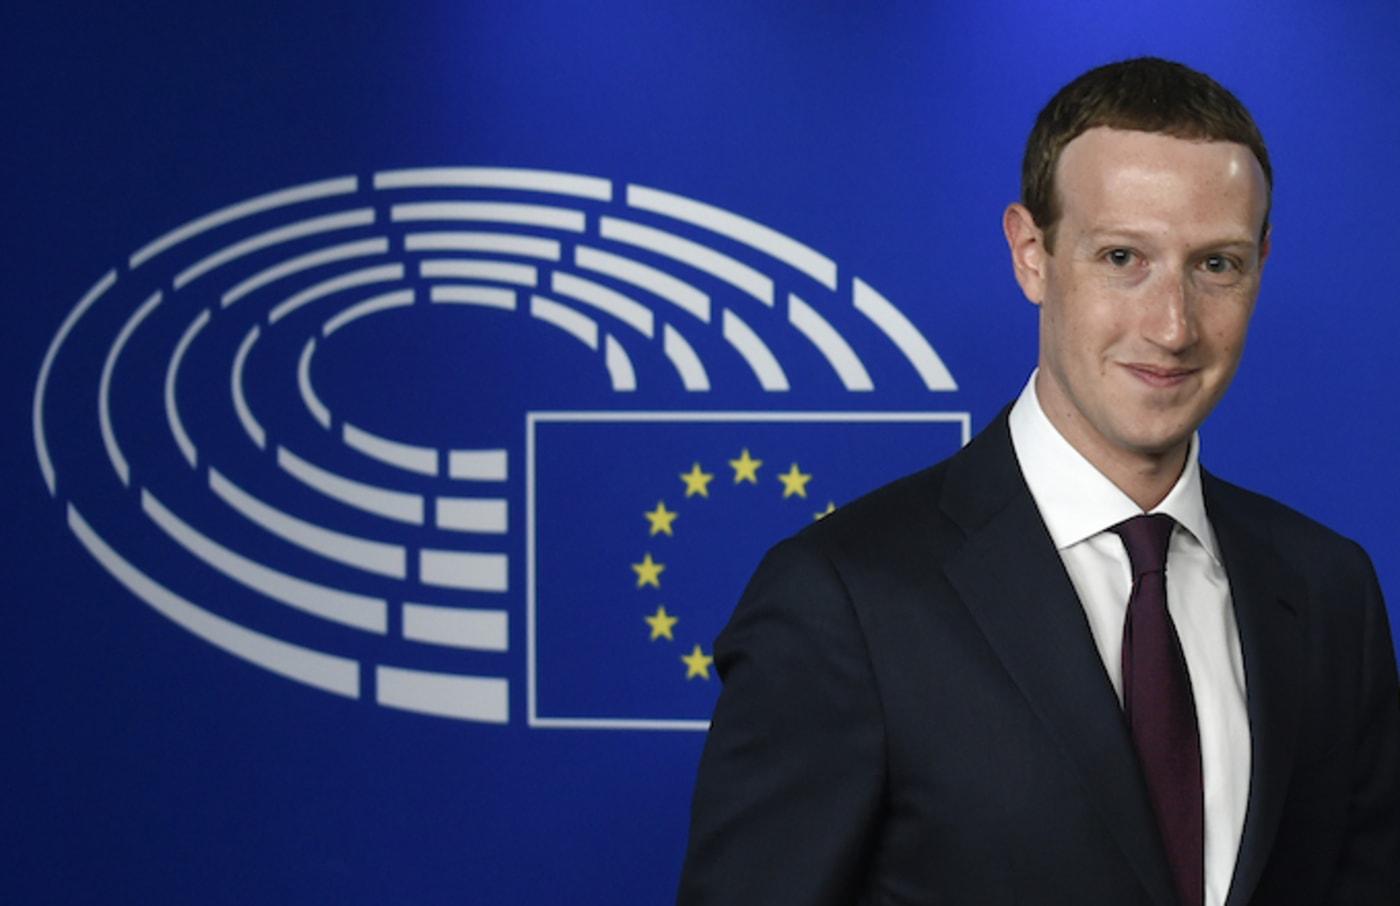 Mark Zuckerberg arrives at the European Parliament.